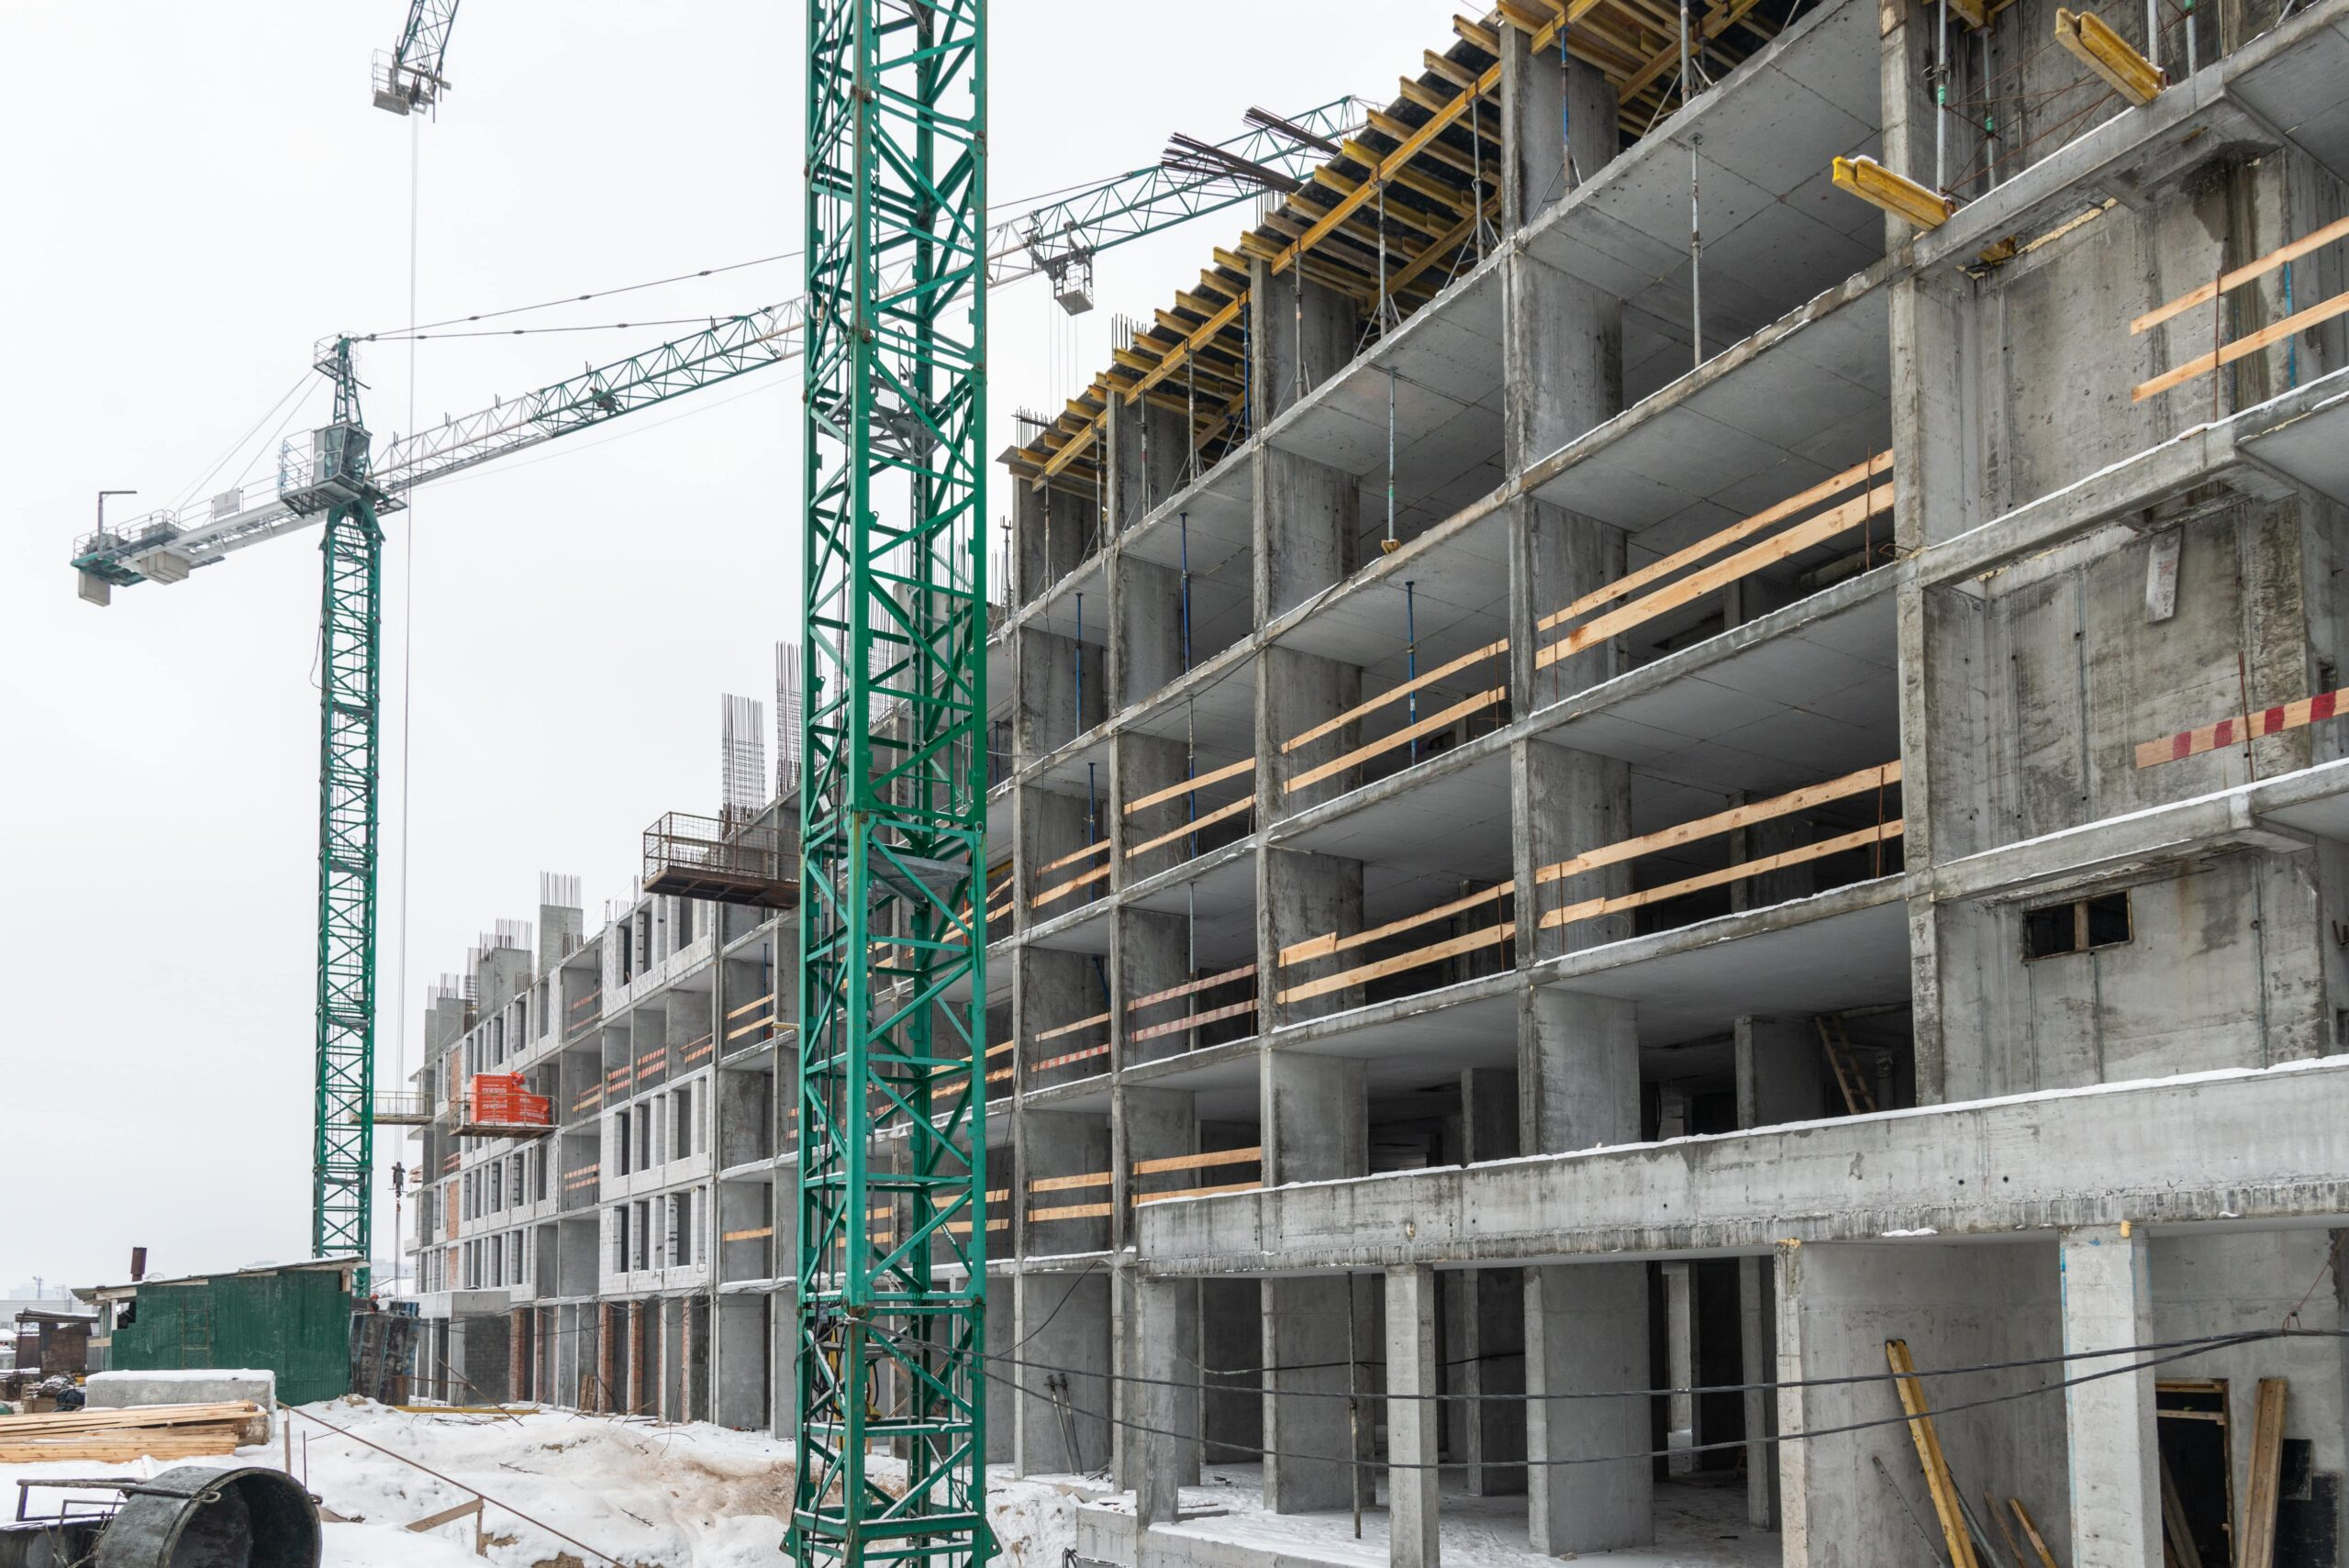 Хід будівництва ЖК Star City у січні 2021